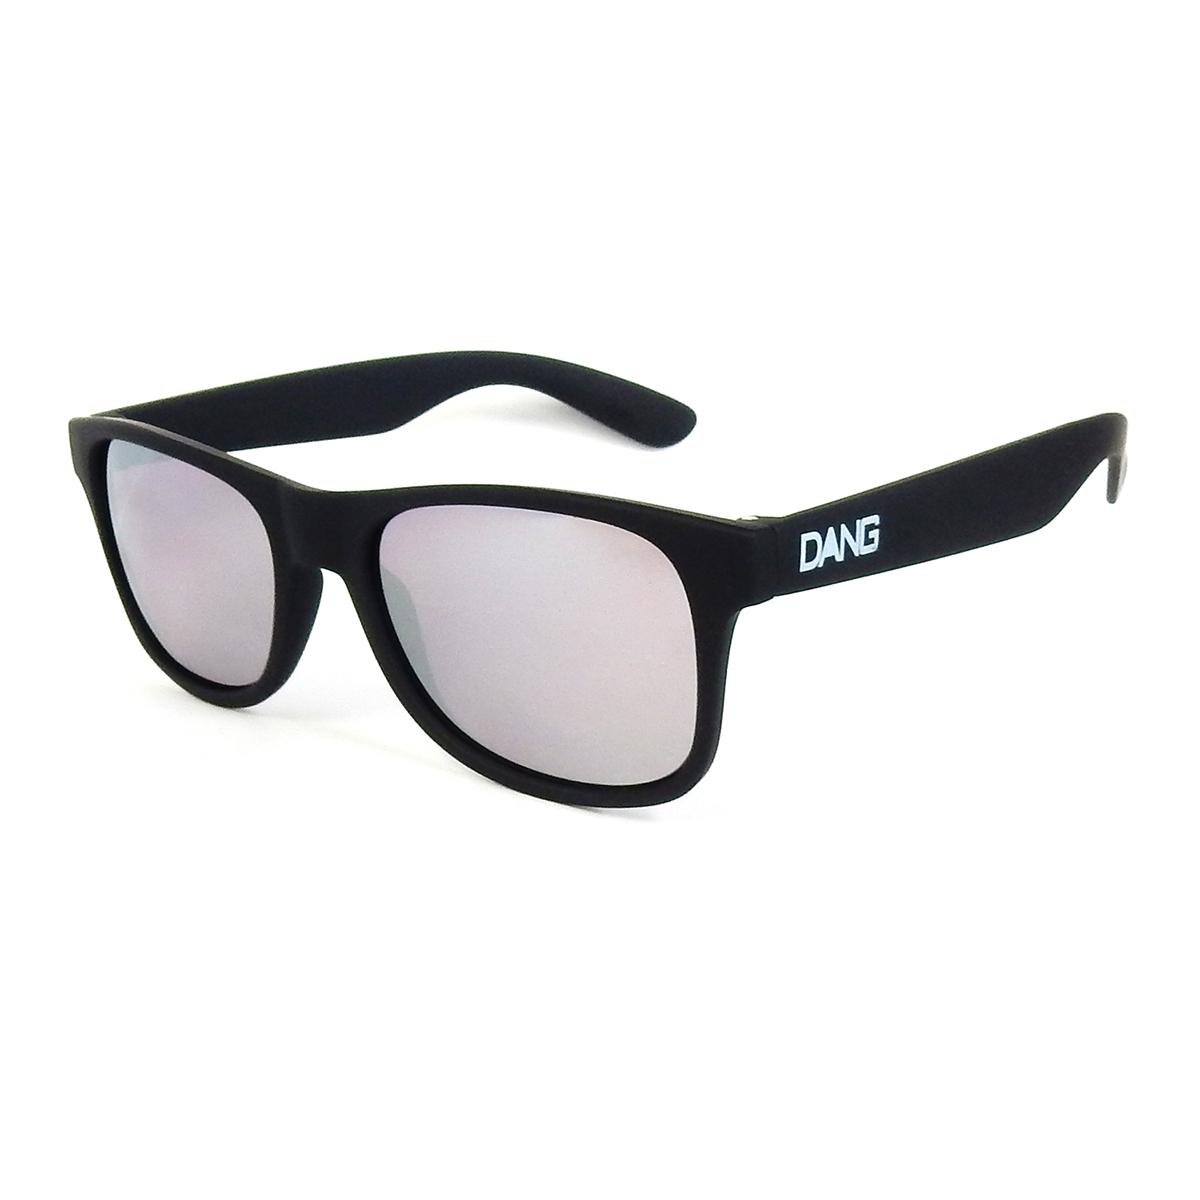 Dang Shades vidg00396 LOCO Black Soft x Silver High Contrast CAT4 Lens サングラス